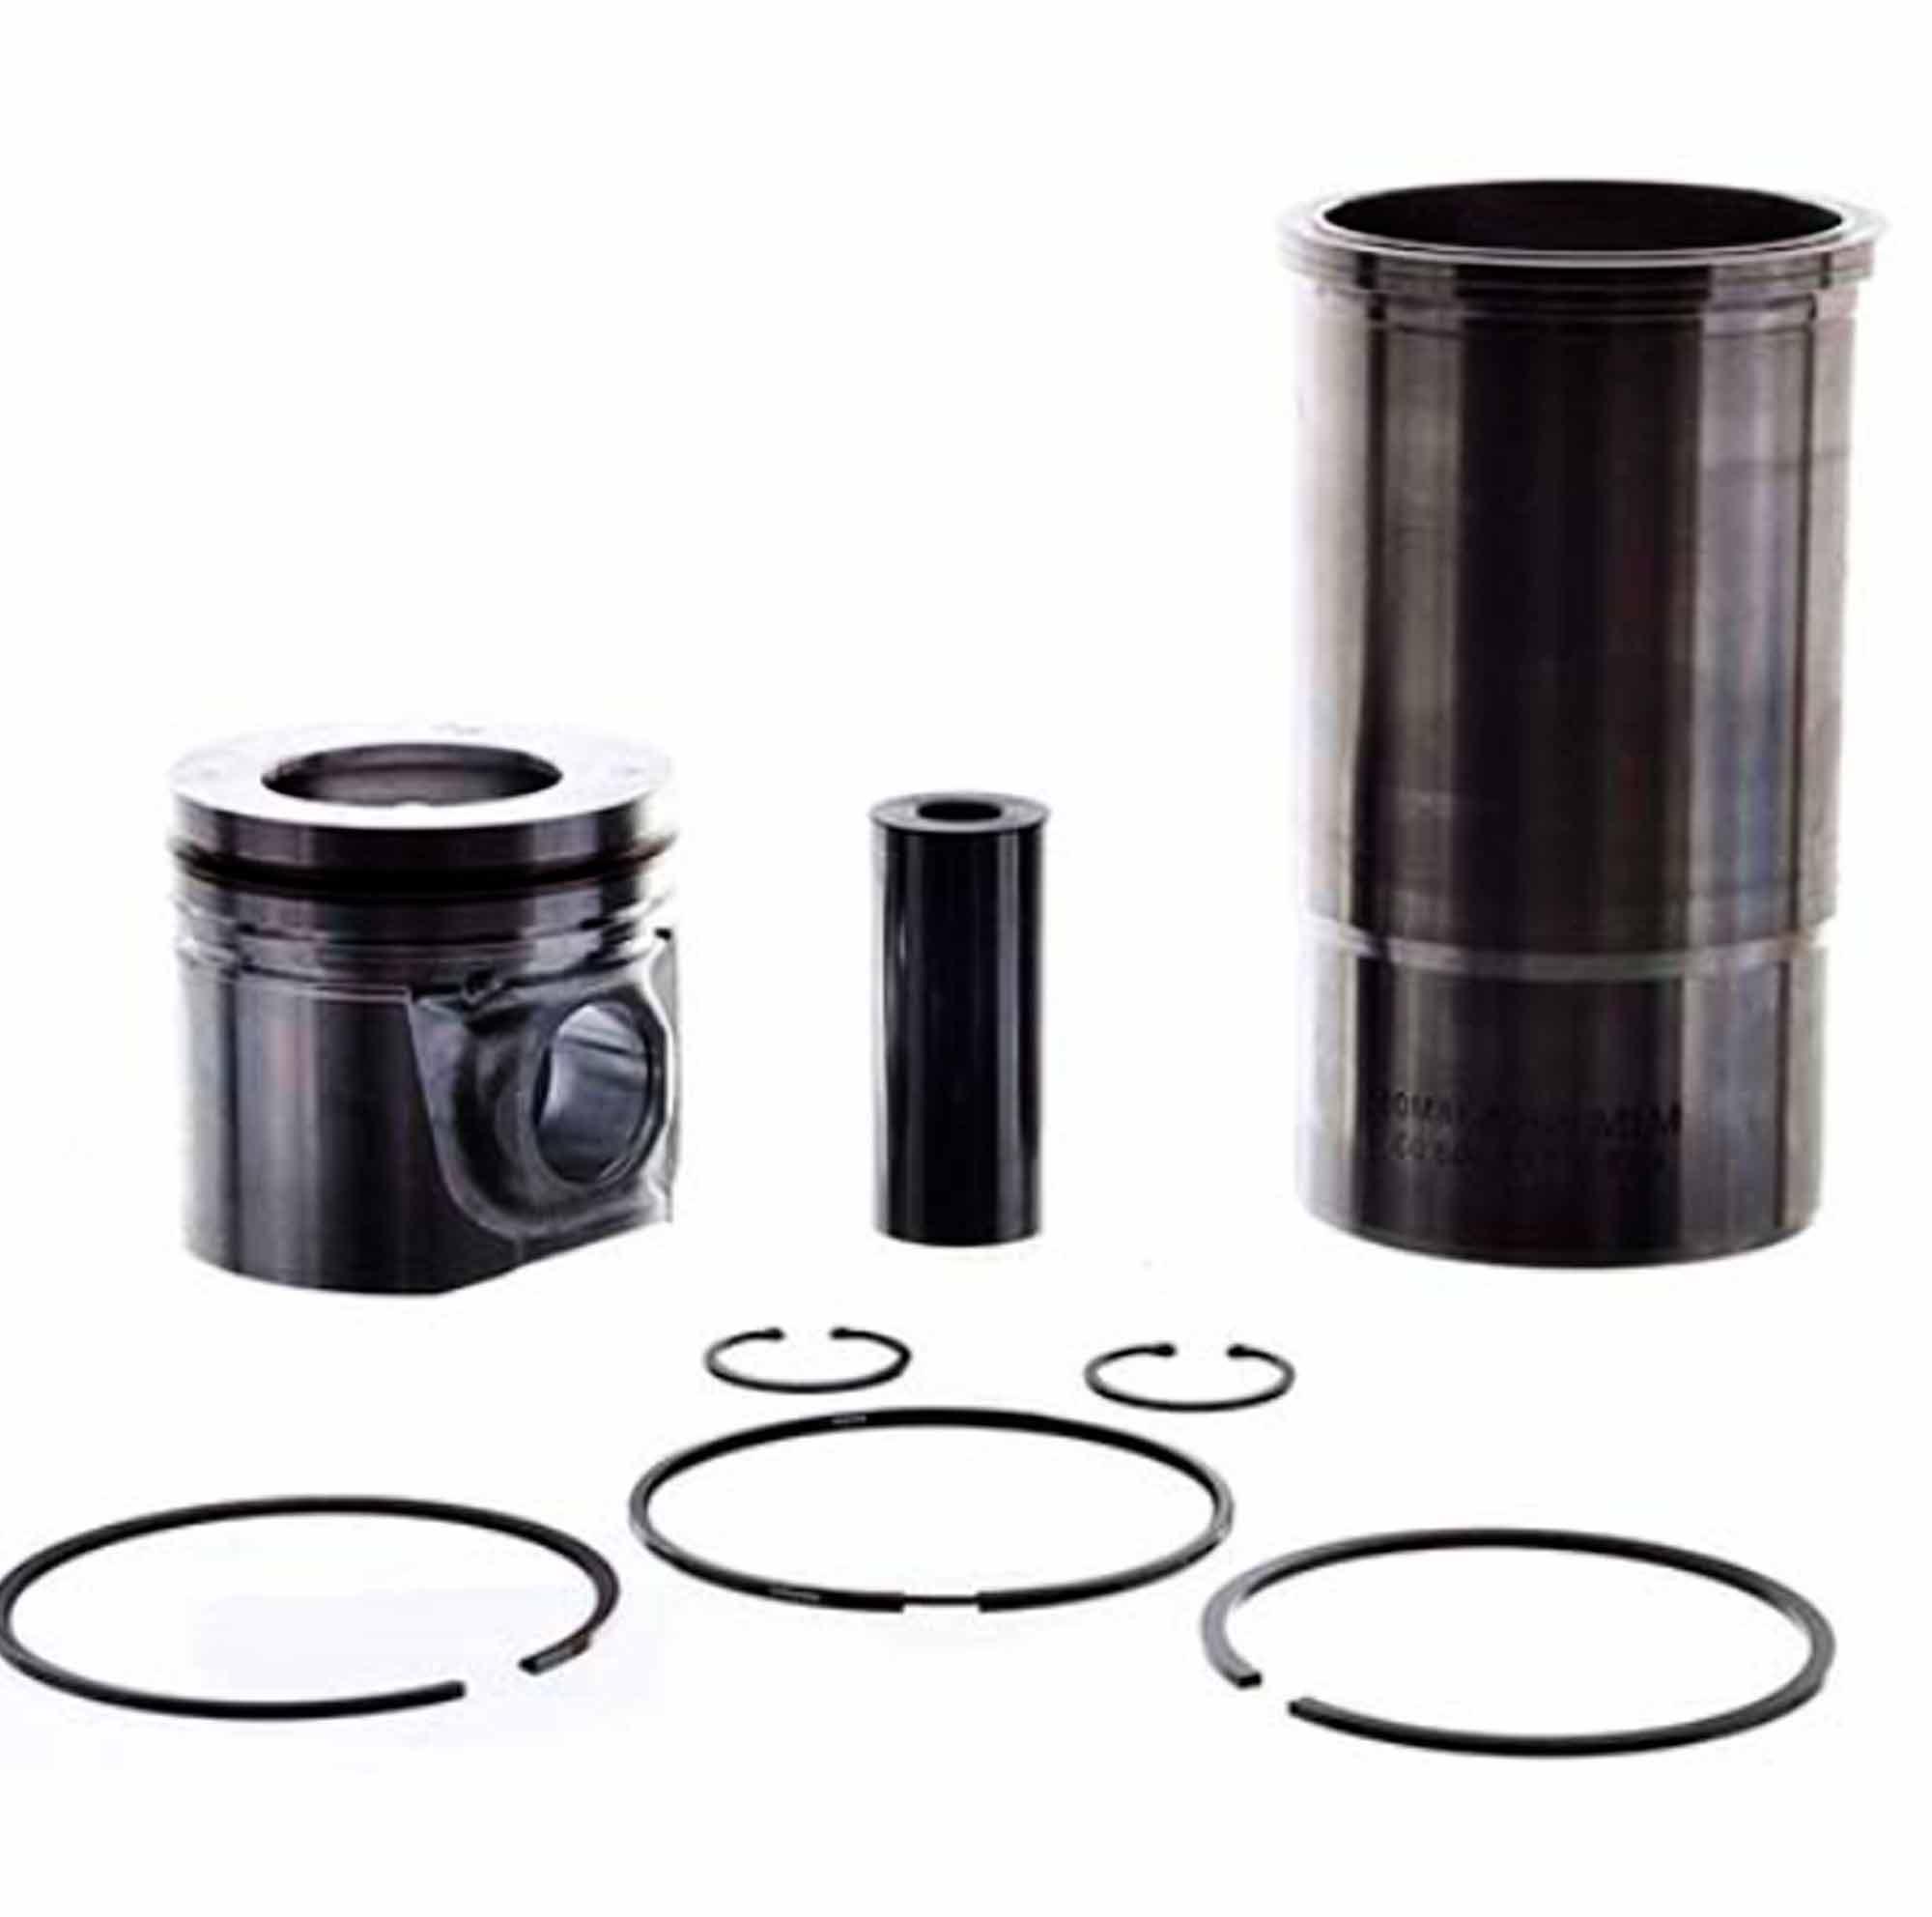 961280190118 - Kit de reparo para 1 cilindro